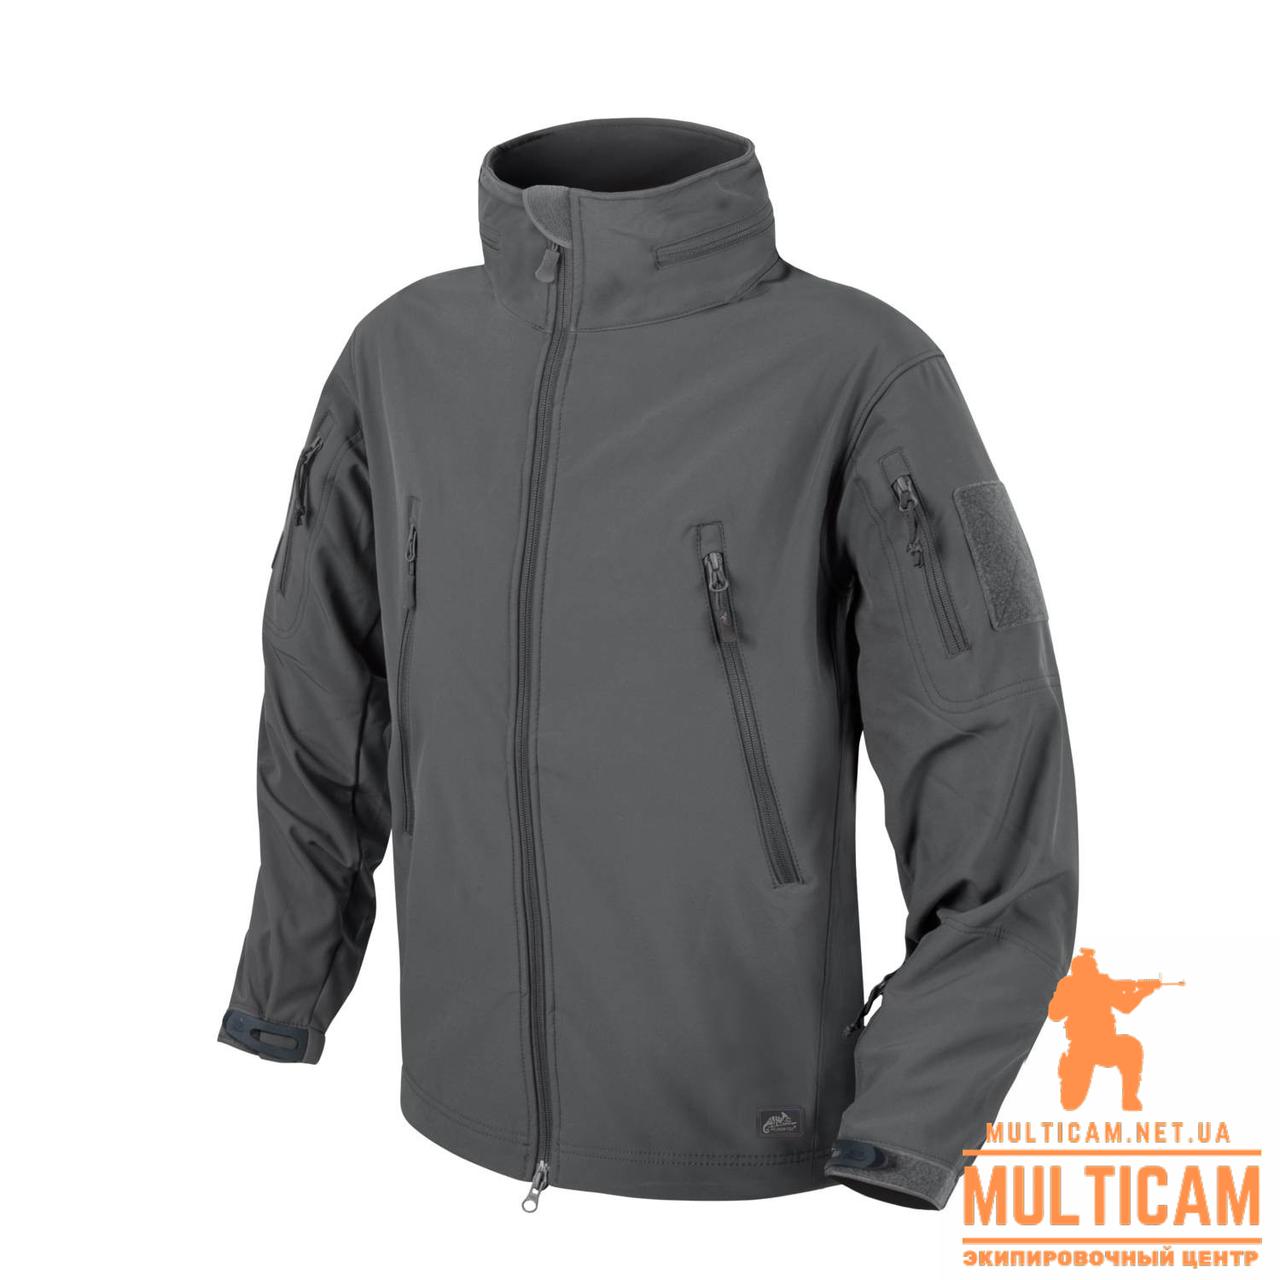 Куртка Helikon-Tex® GUNFIGHTER Jacket - Shark Skin Windblocker - Shadow Grey